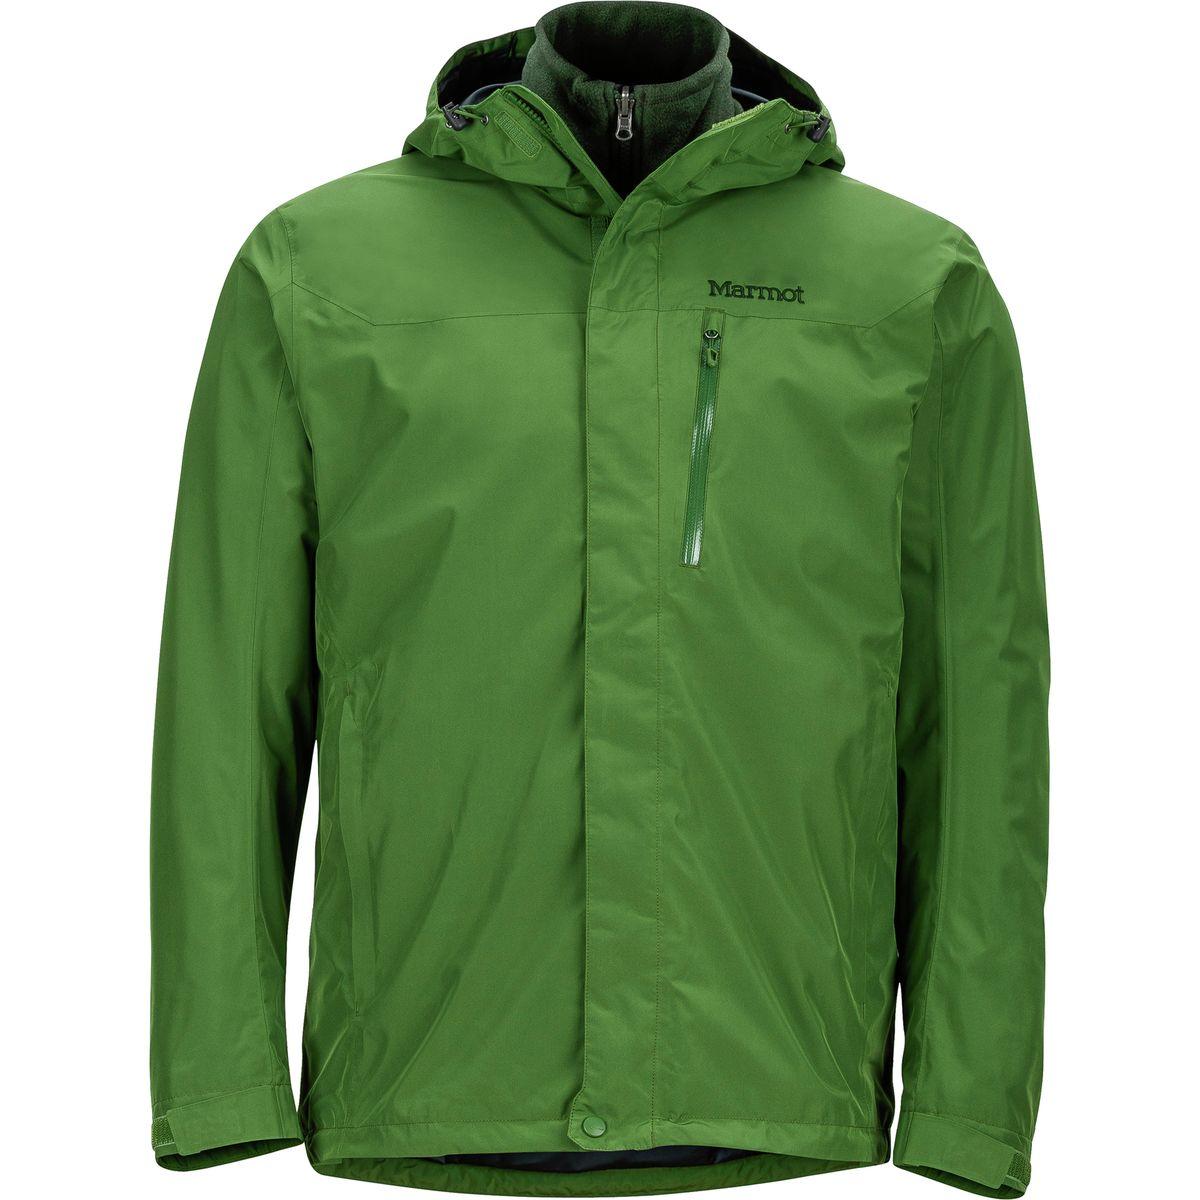 Marmot Ramble Component Jacket - Men